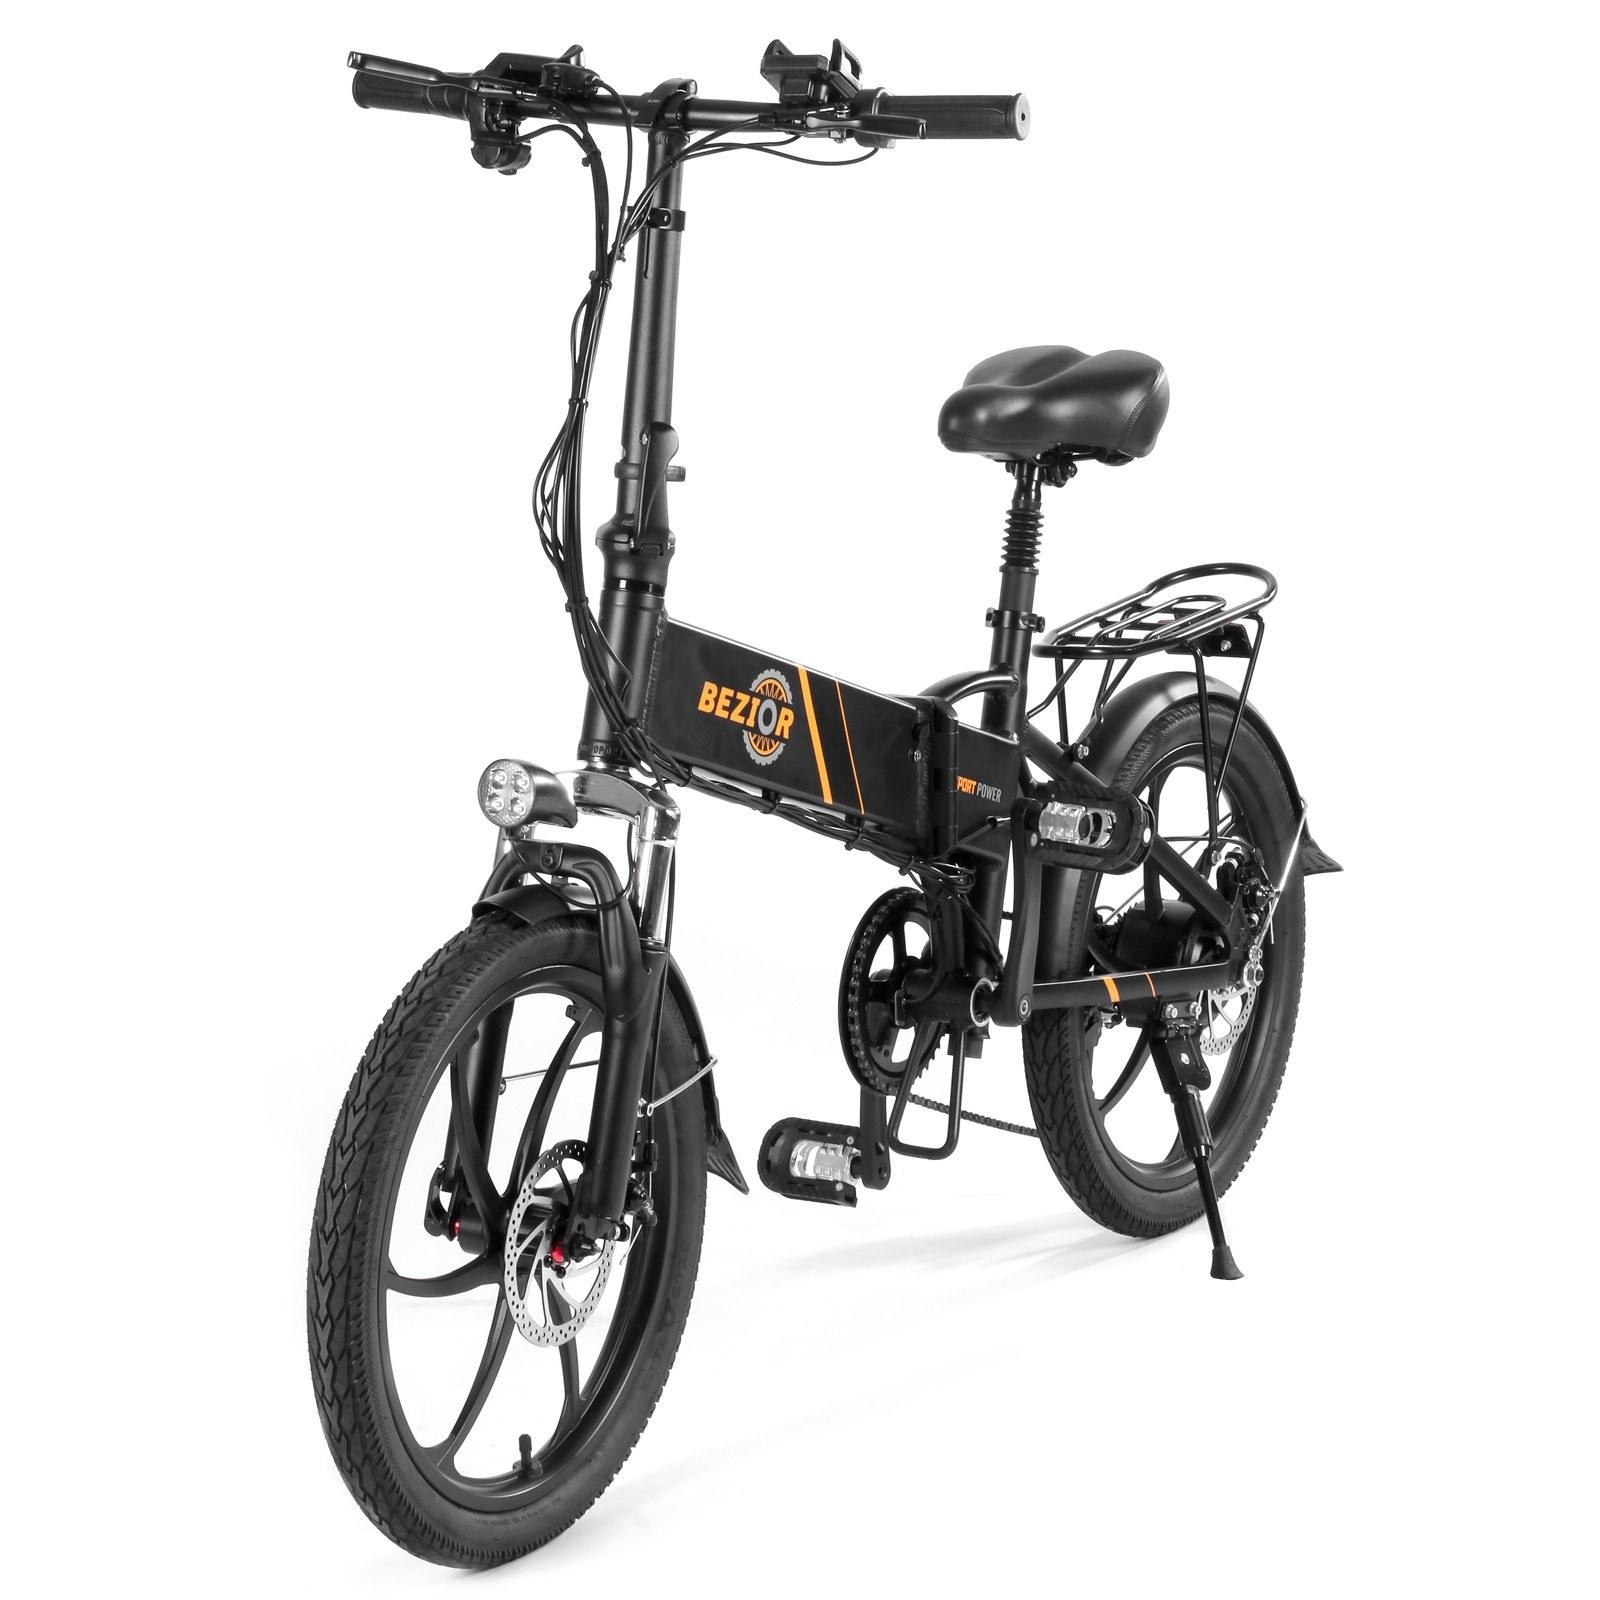 tomtop.com - [EU Warehouse] $175 OFF BEZIOR M20 350W 20 Inch Folding Power Assist Electric Bike, $789.99 (Inclusive of VAT)